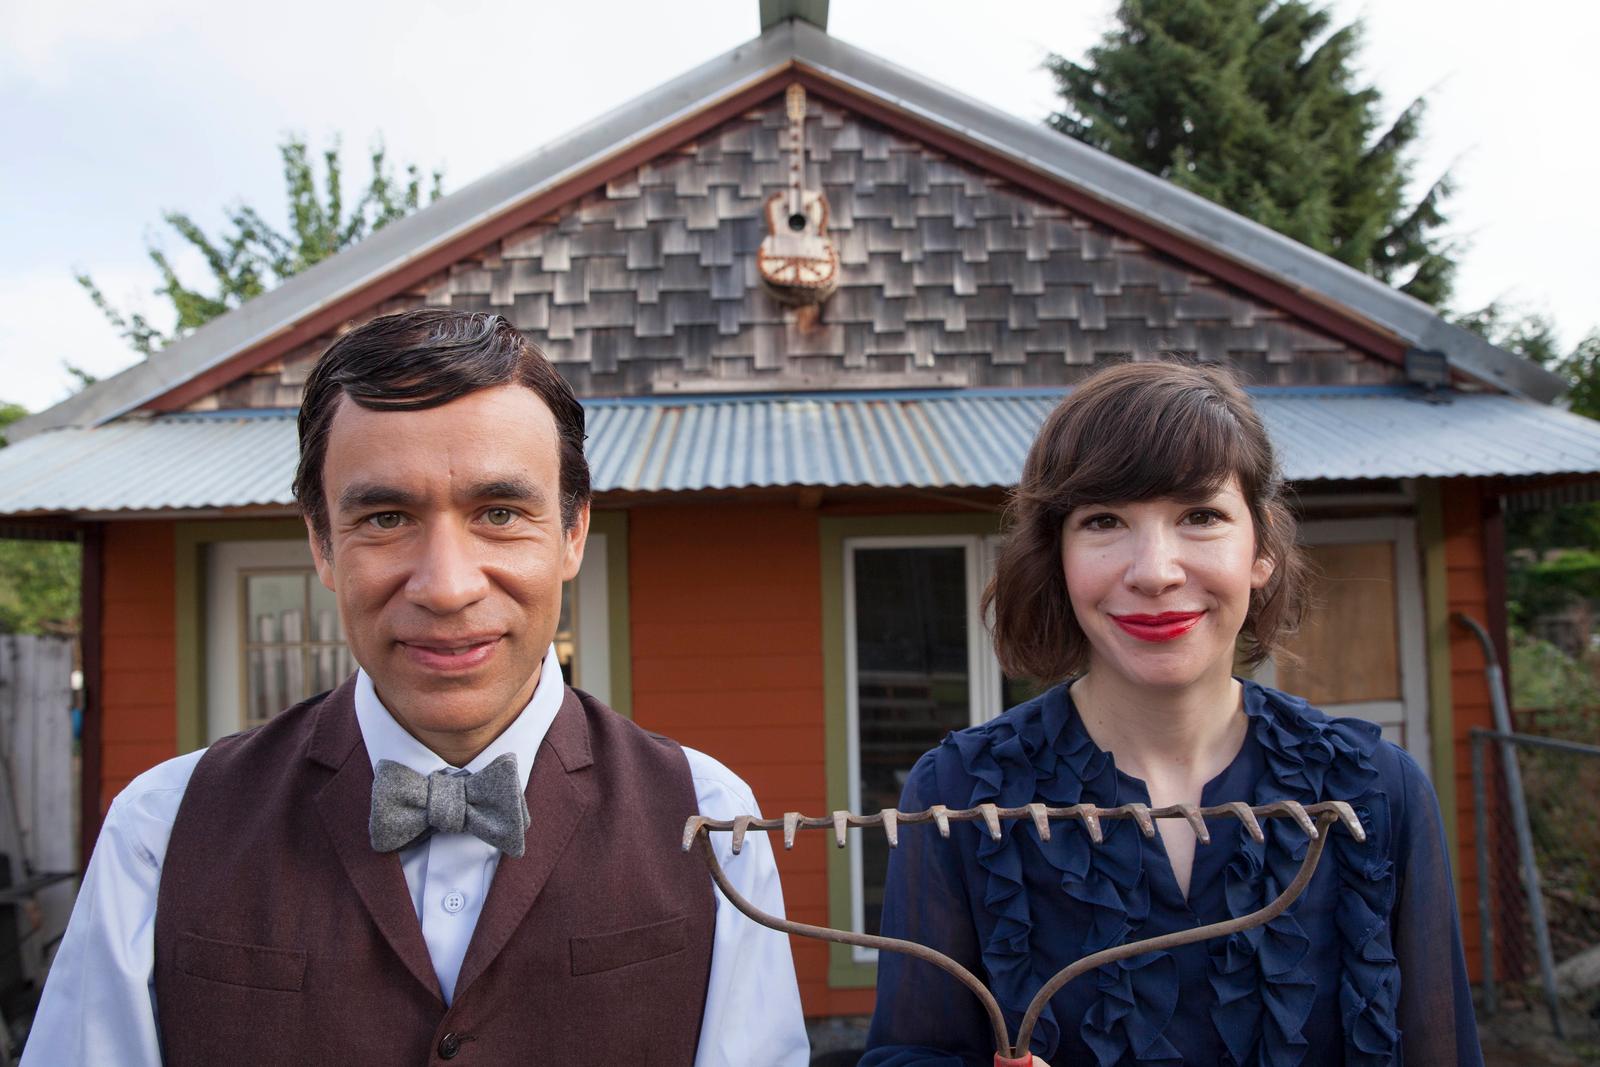 Fred Armisen and Carrie Brownstein in Portlandia. (photo: Chris Hornbecker/IFC)